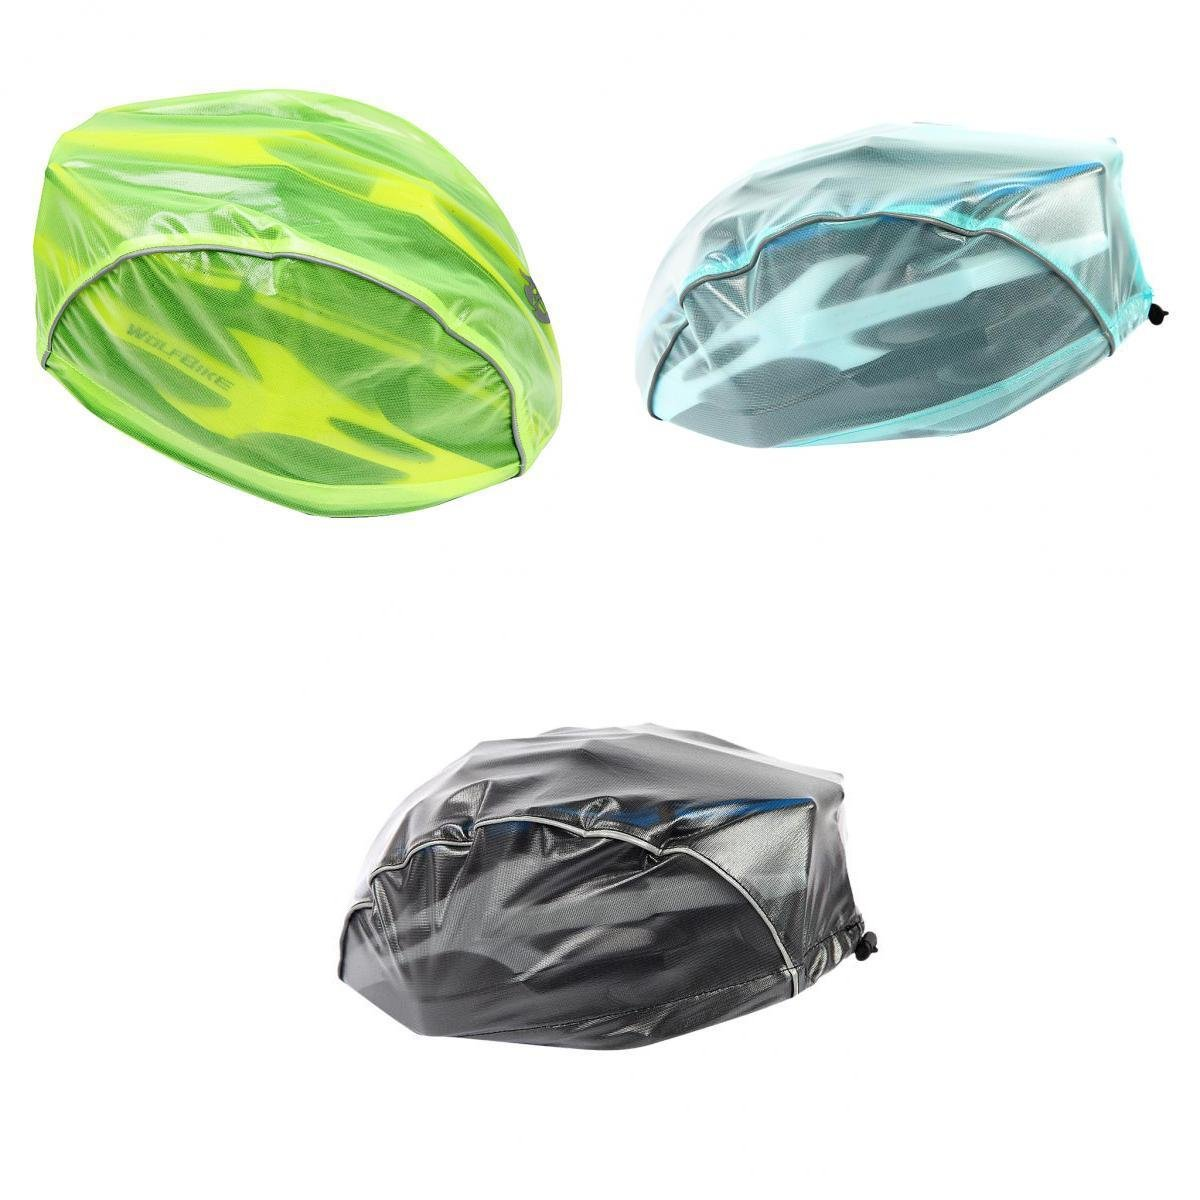 MagiDeal 3 Piezas de Cubiertas de Casco de Bicicleta Rainproof Downhill MTB Road Bike Cycling Casco Set